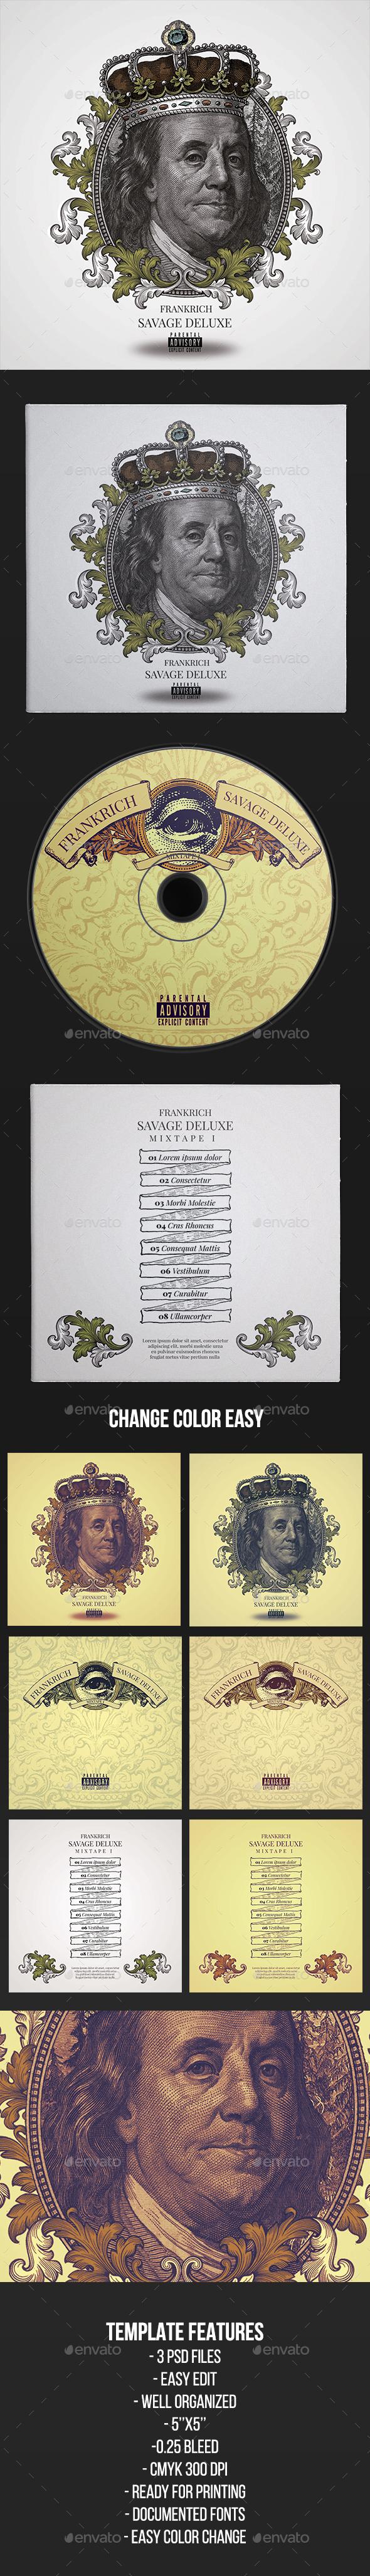 Savage Deluxe - CD Cover Artwork Template - CD & DVD Artwork Print Templates